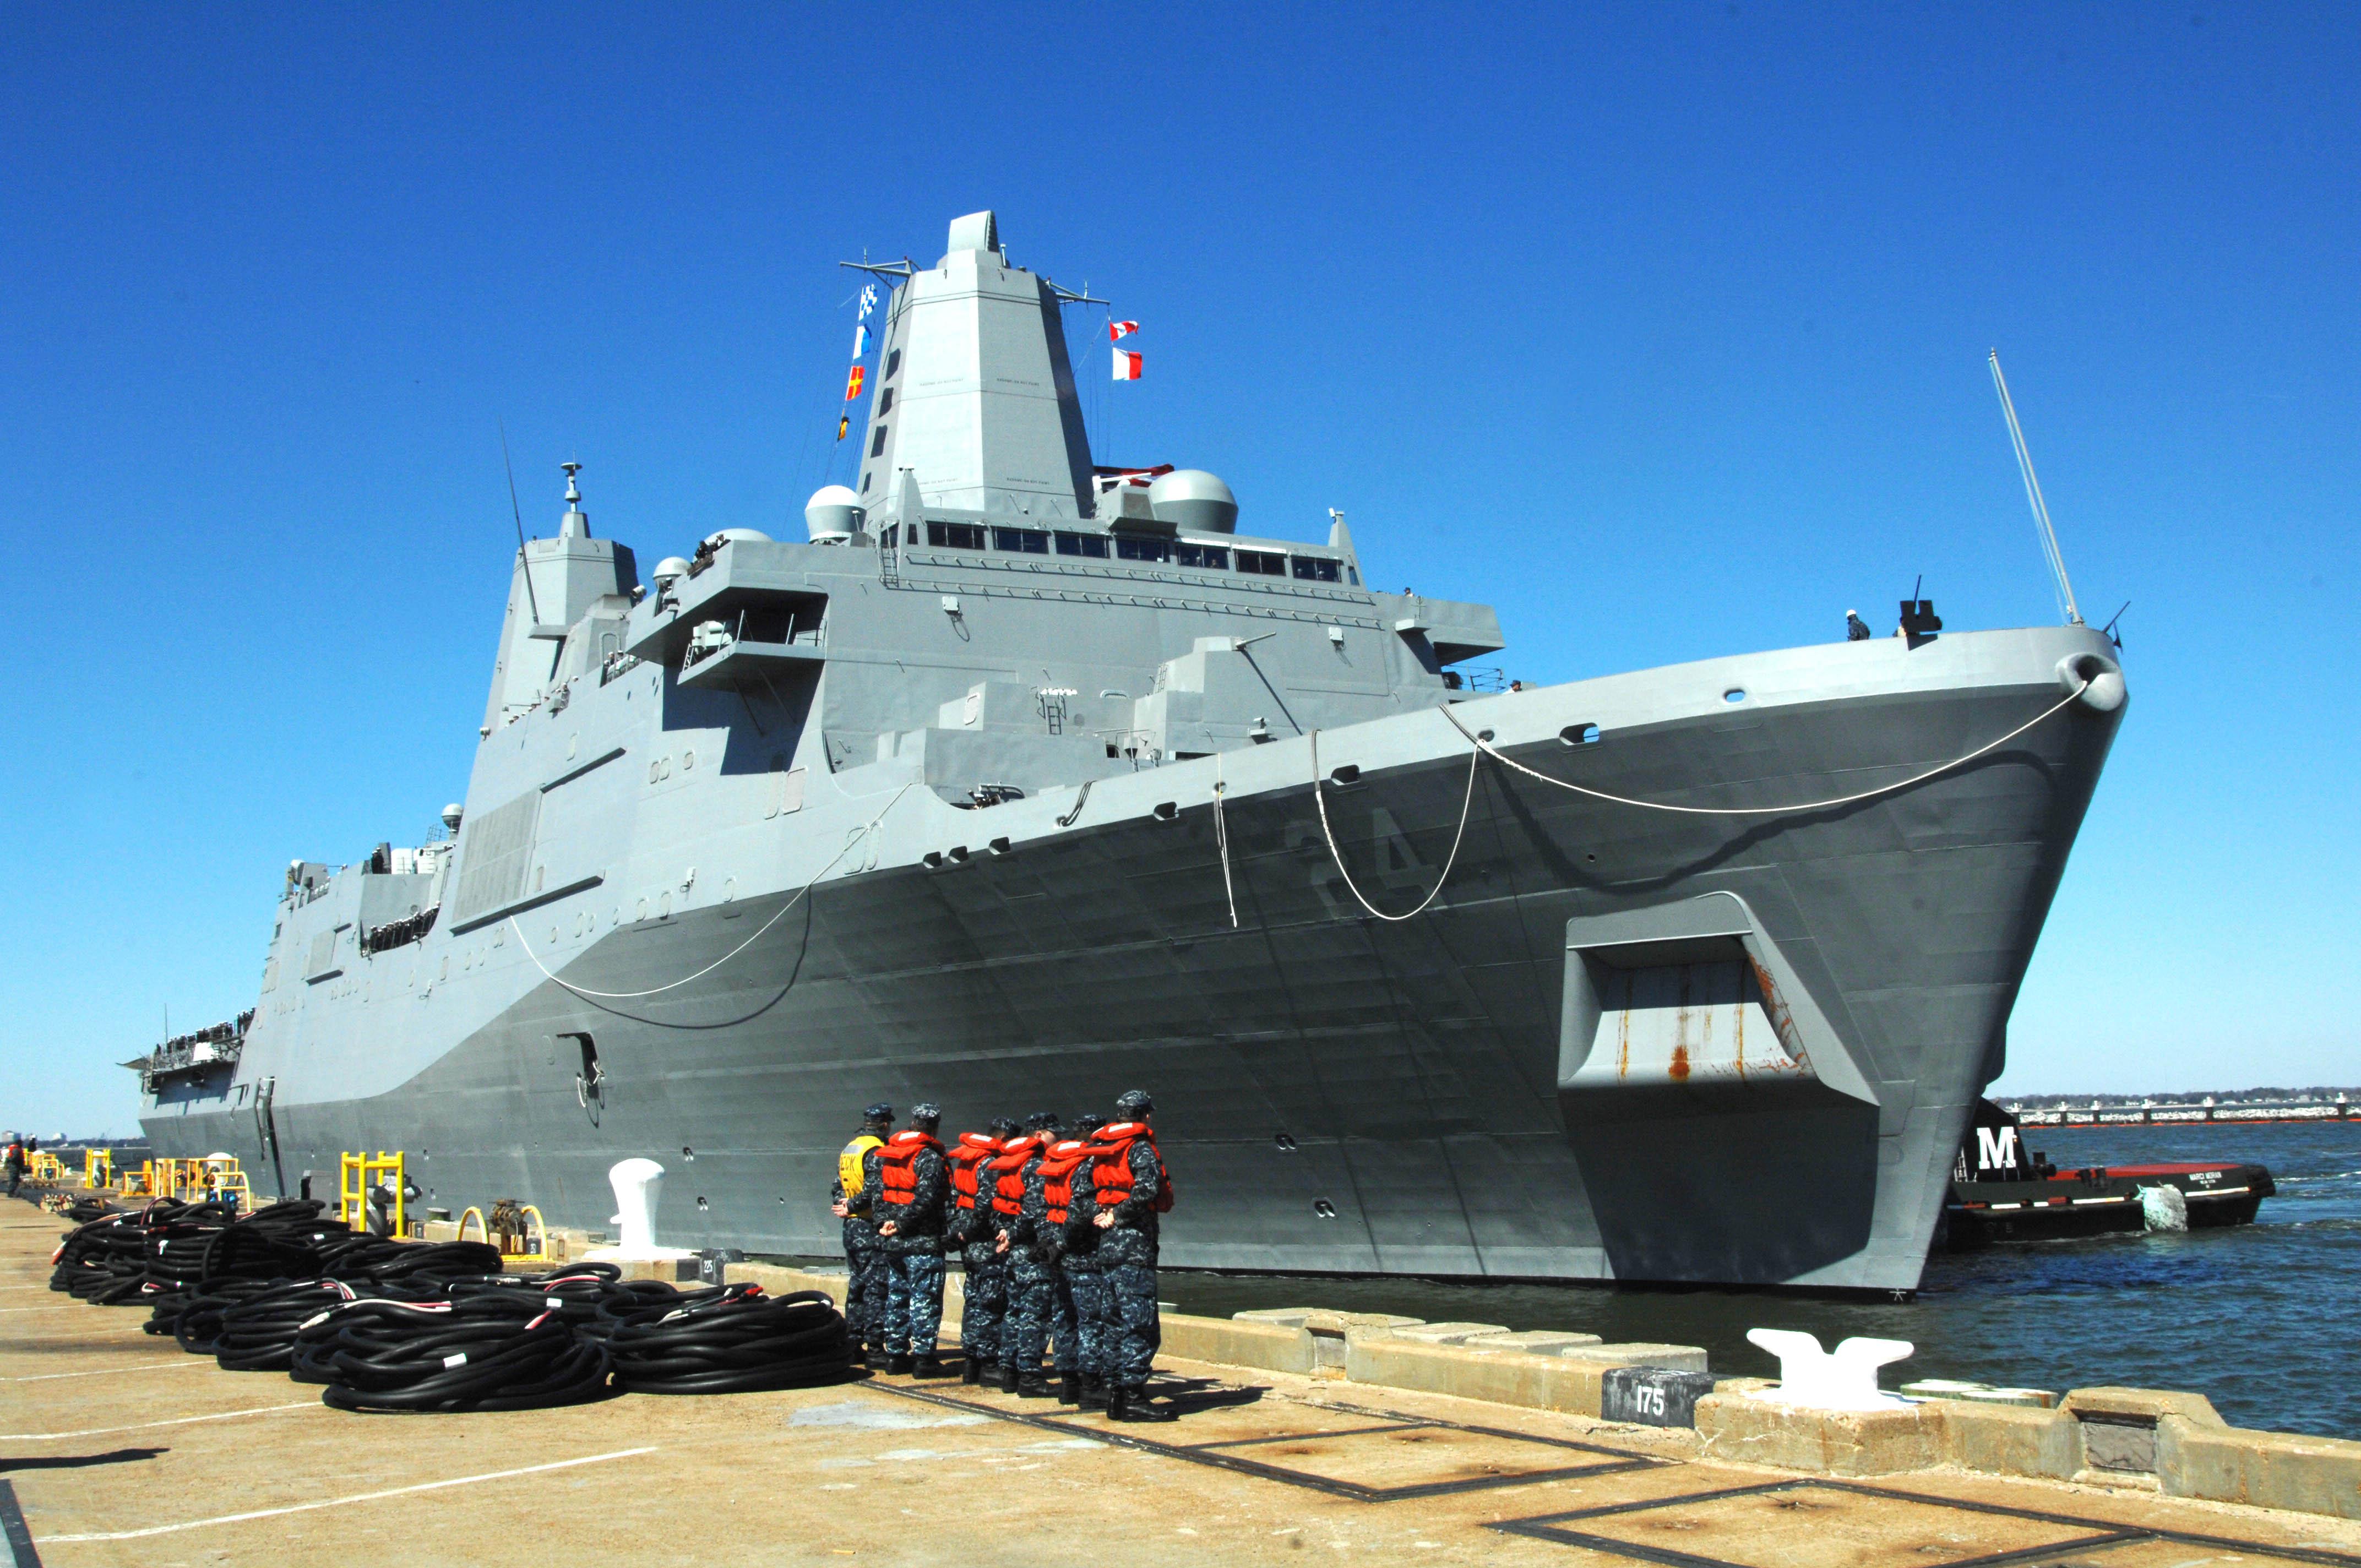 USS ARLINGTON LPD-24 Ankunft Norfolk 22.03.2013Bild: U.S. Navy